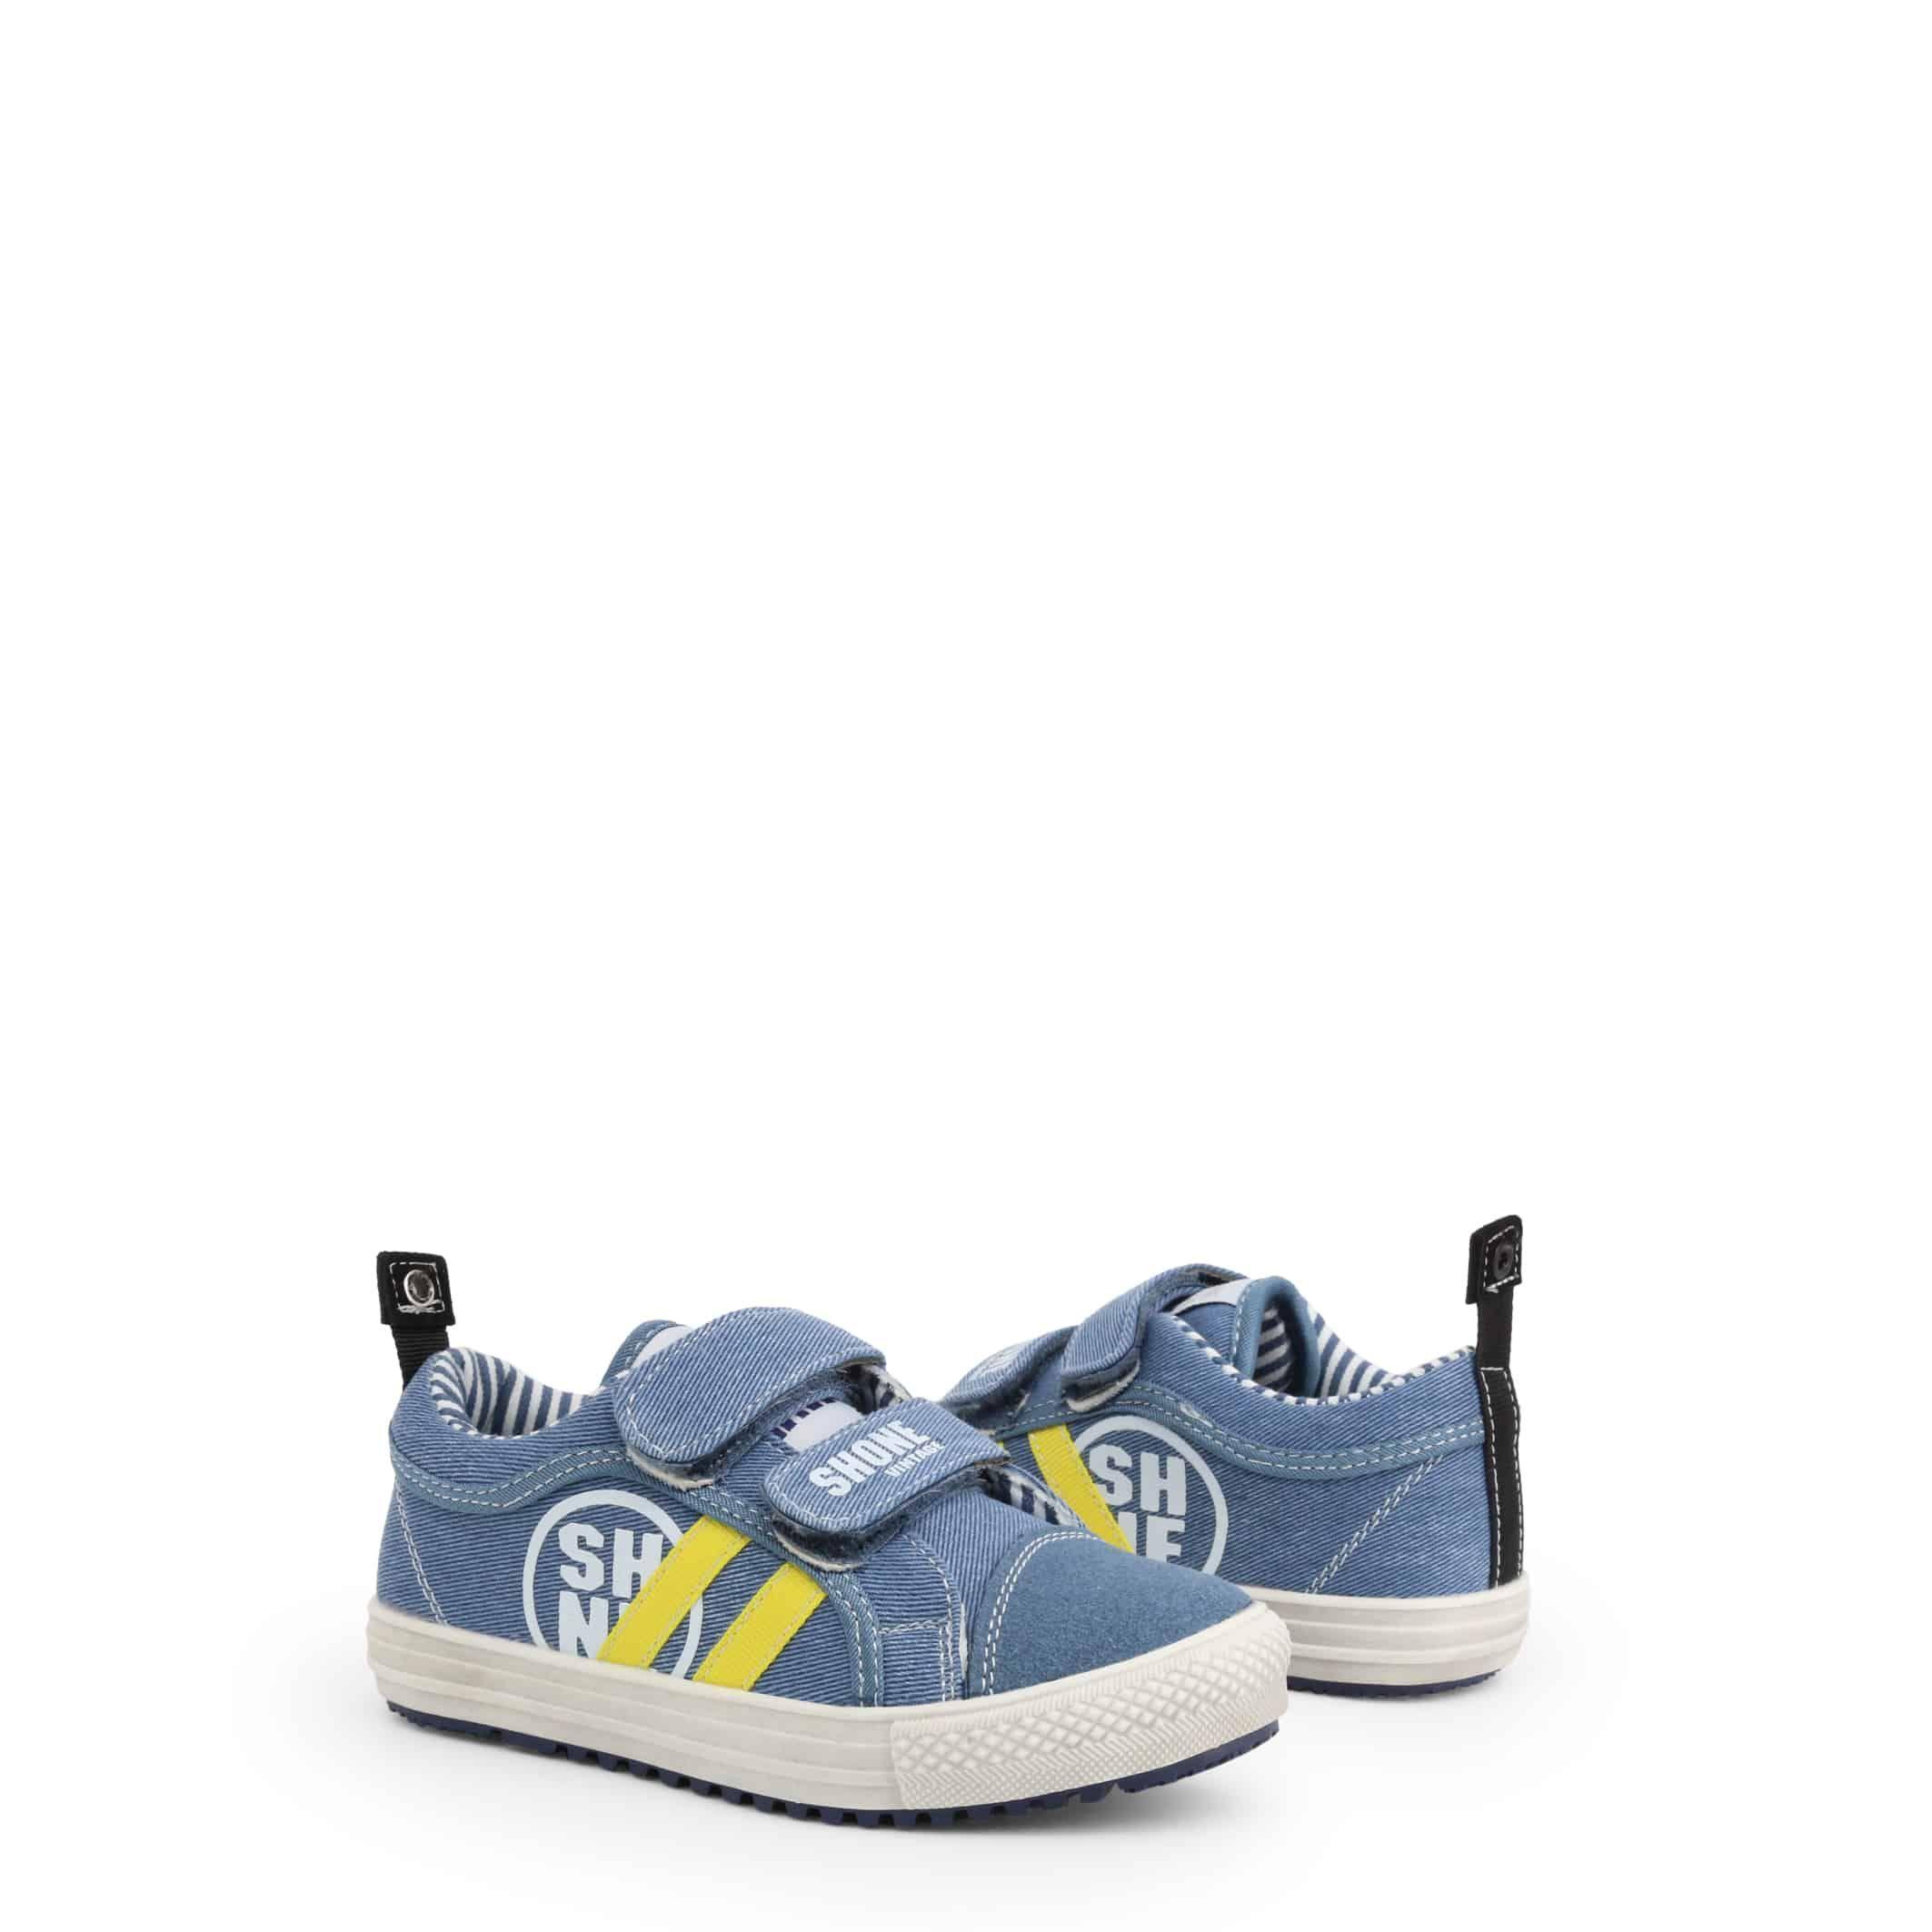 Sneakers Shone – 184-120